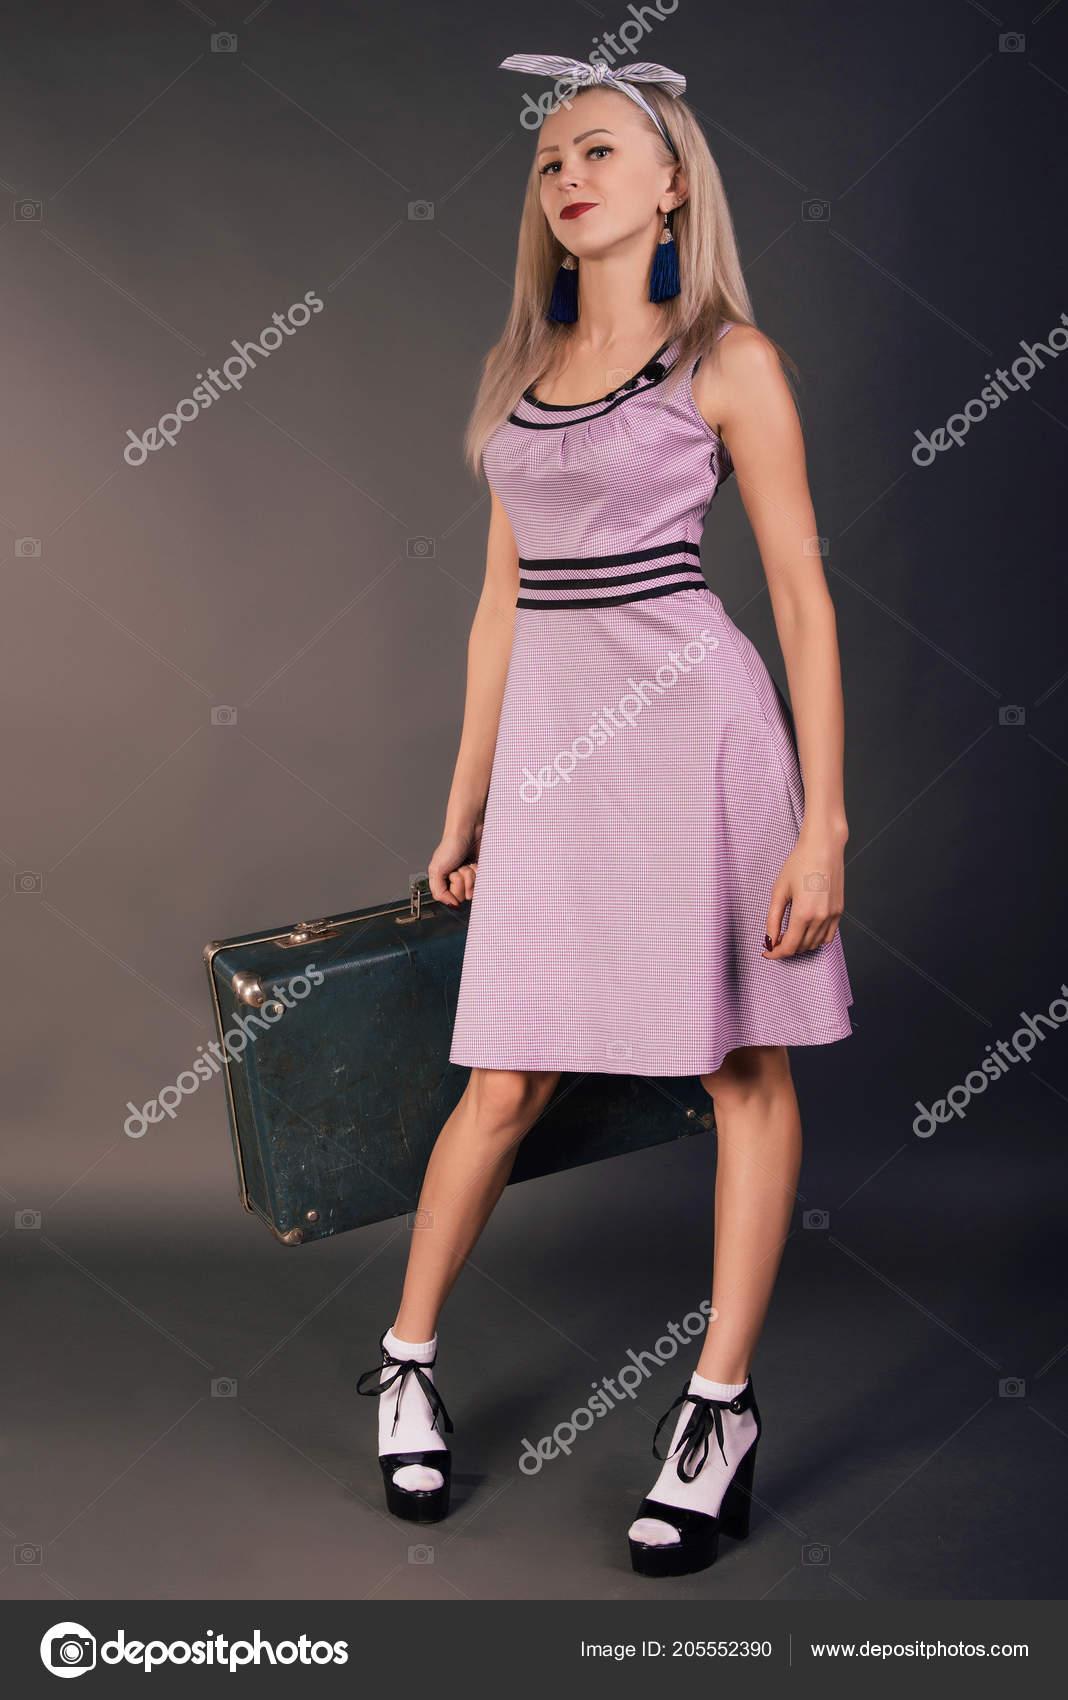 Pin Girl Dress Suitcase Slim Beautiful